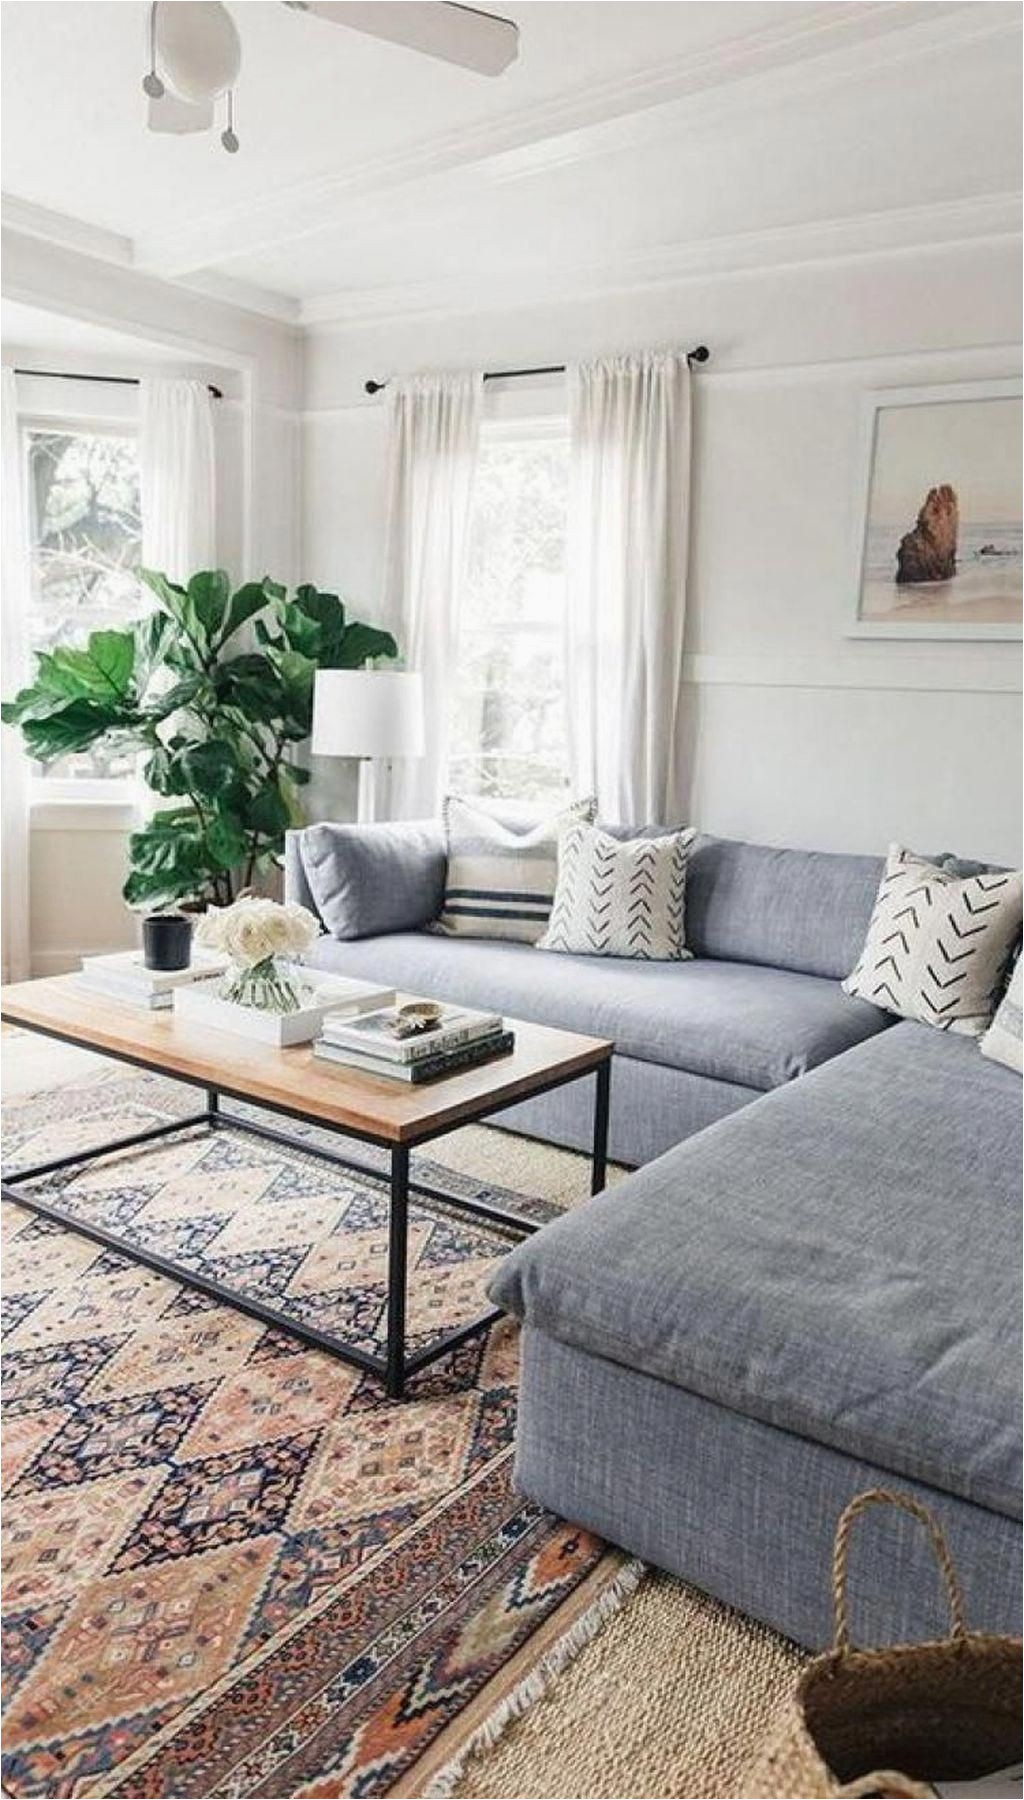 Home Decorators Collection Elegance Linen area Rug Home Decorators Collection Elegance Linen area Rug